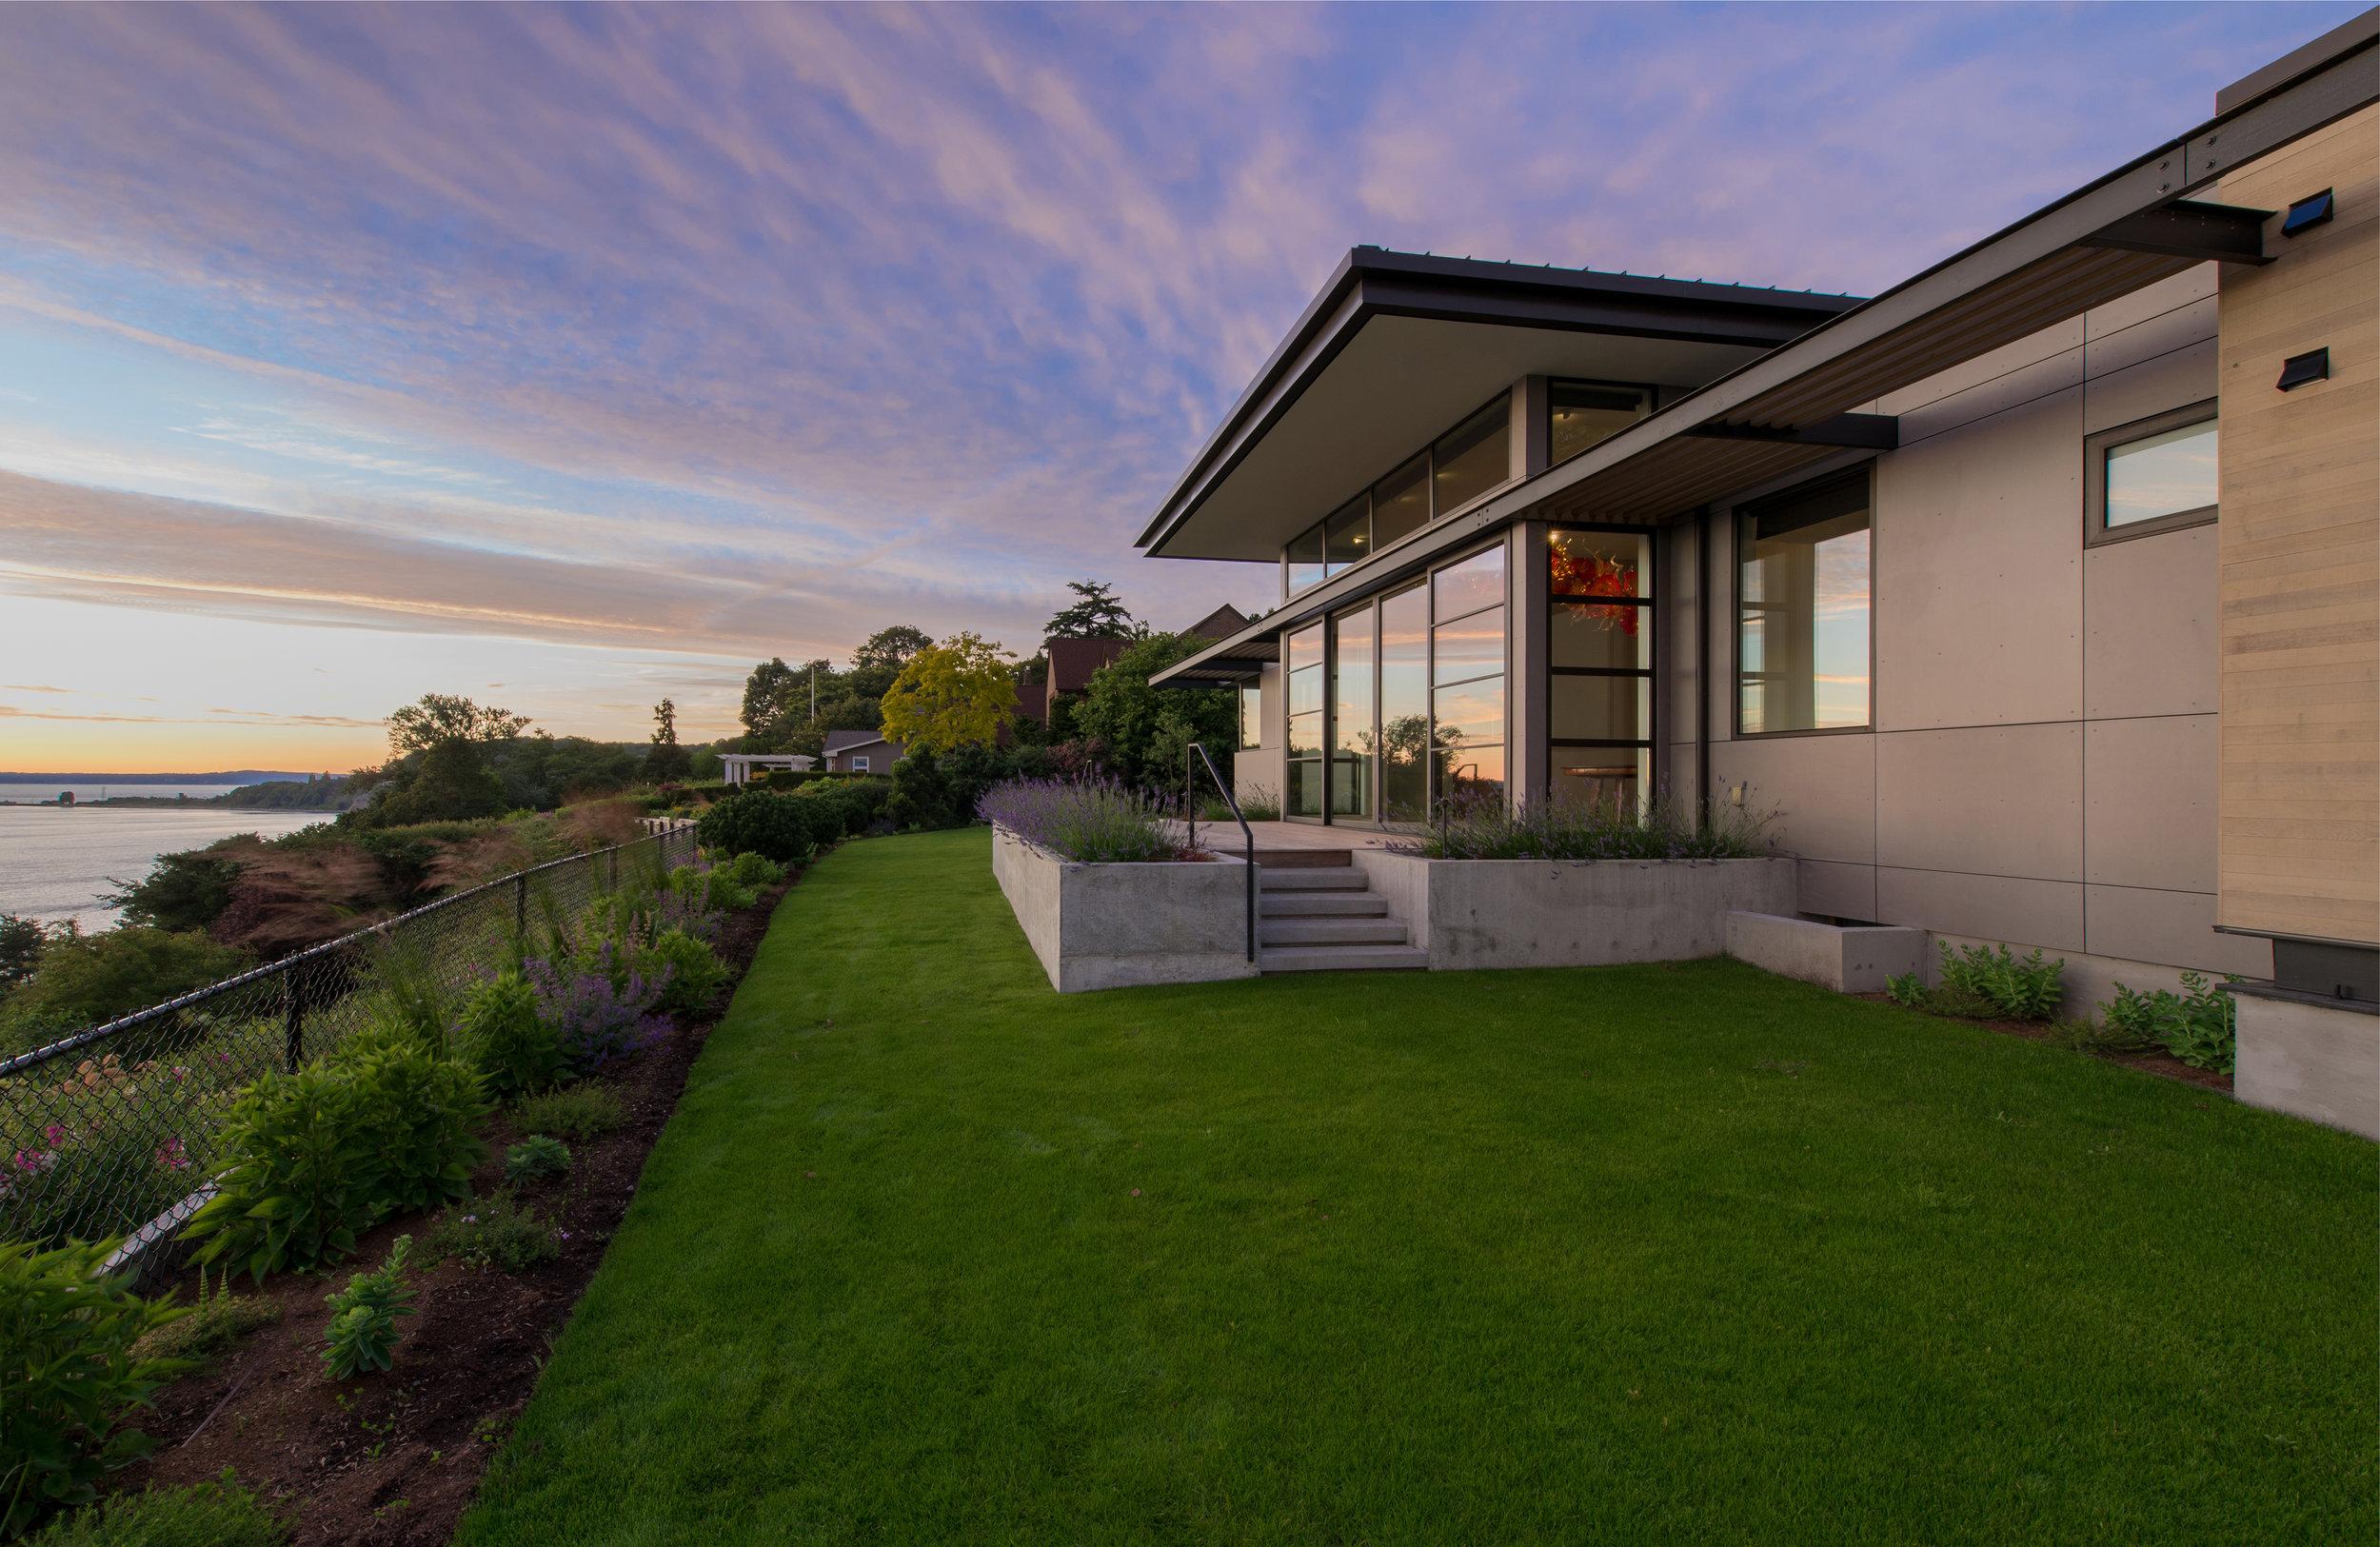 BUILD-LLC-HGH-W-Sunset-02#.jpg